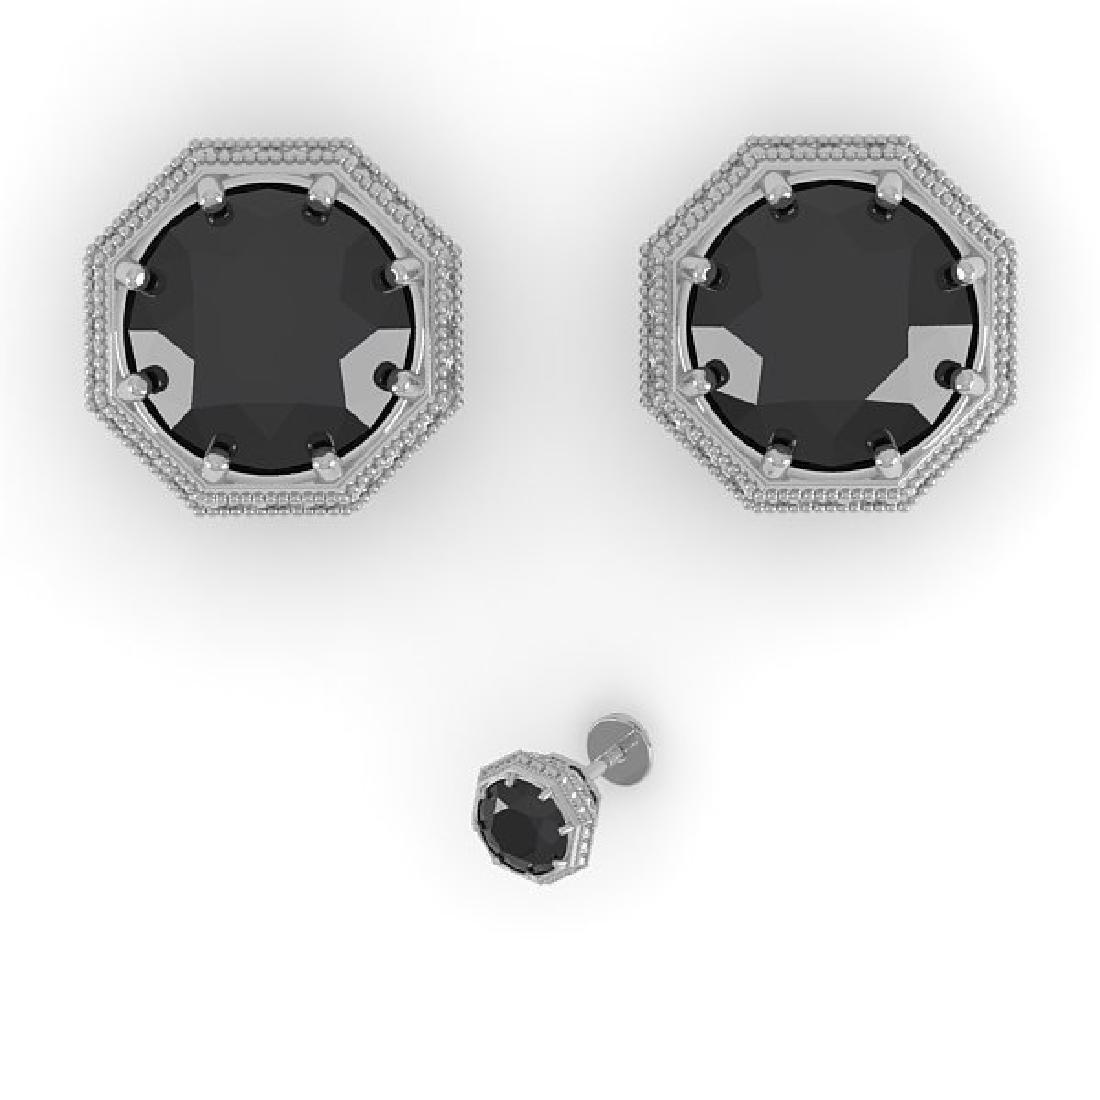 2.0 CTW Black Diamond Stud Solitaire Earrings 14K White - 2